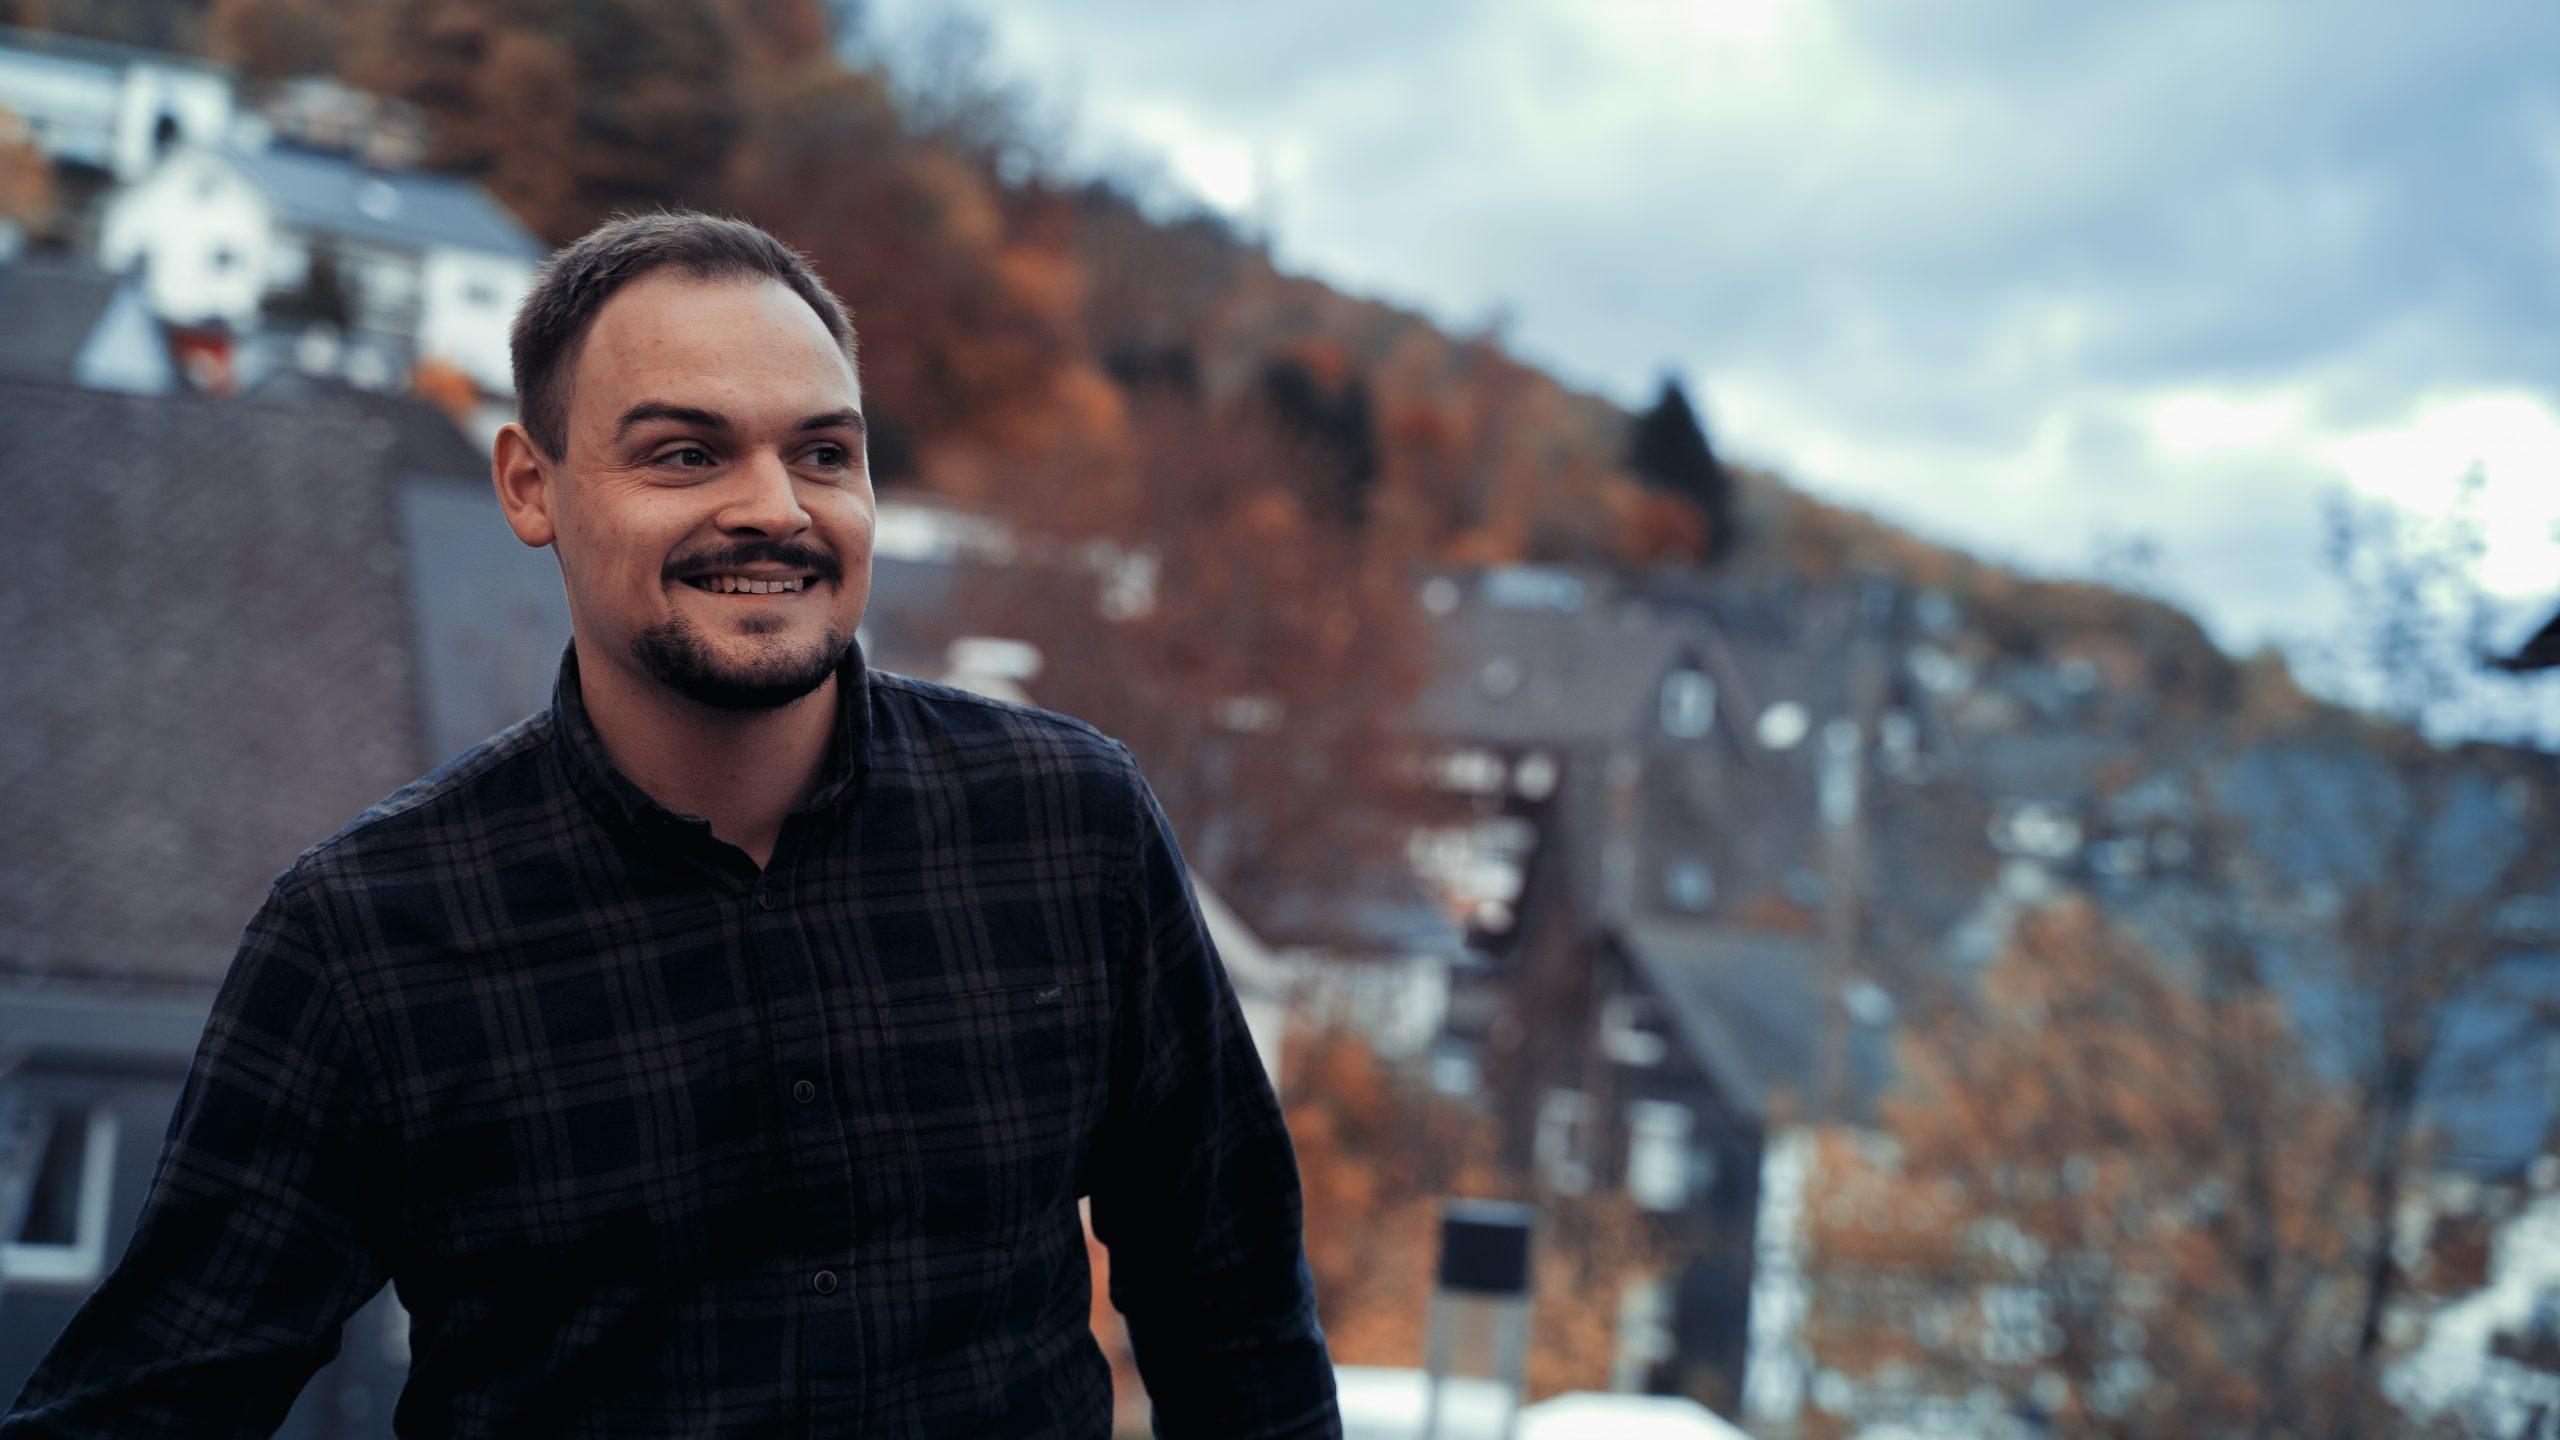 Fotoshooting Siegen, Waivbeats, Fotograf in Westerwald